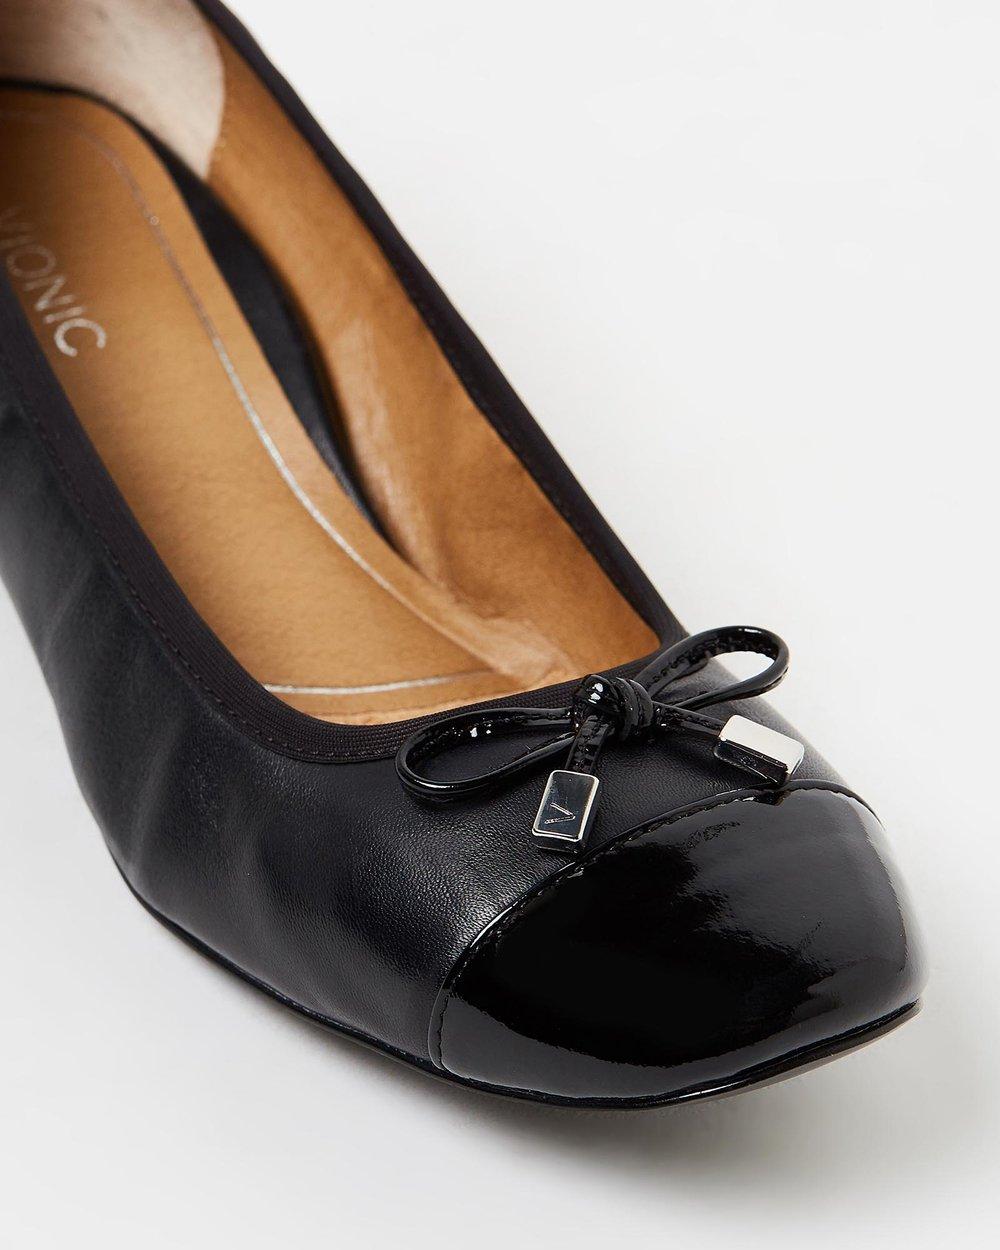 3c64d1f0f153 Daphne Block Heels by Vionic Online